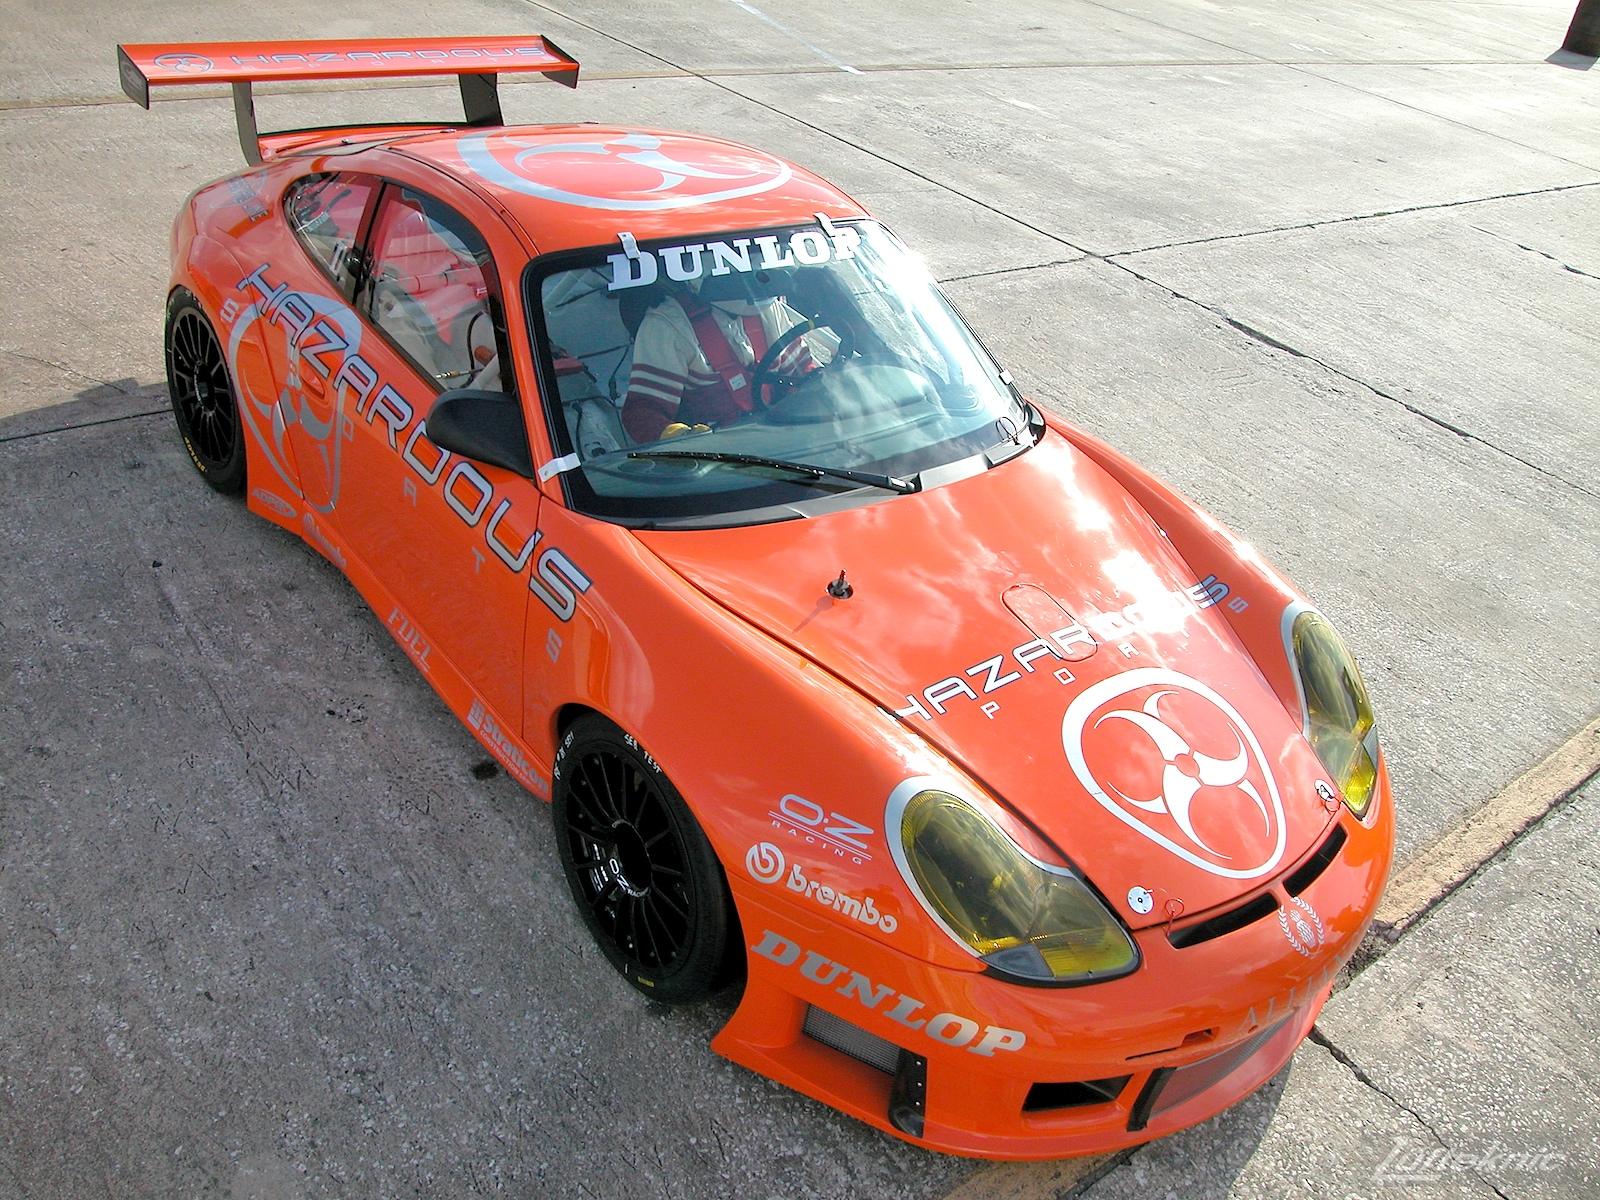 2003 Hazardous Sports Porsche 996 GT3 RS at Sebring